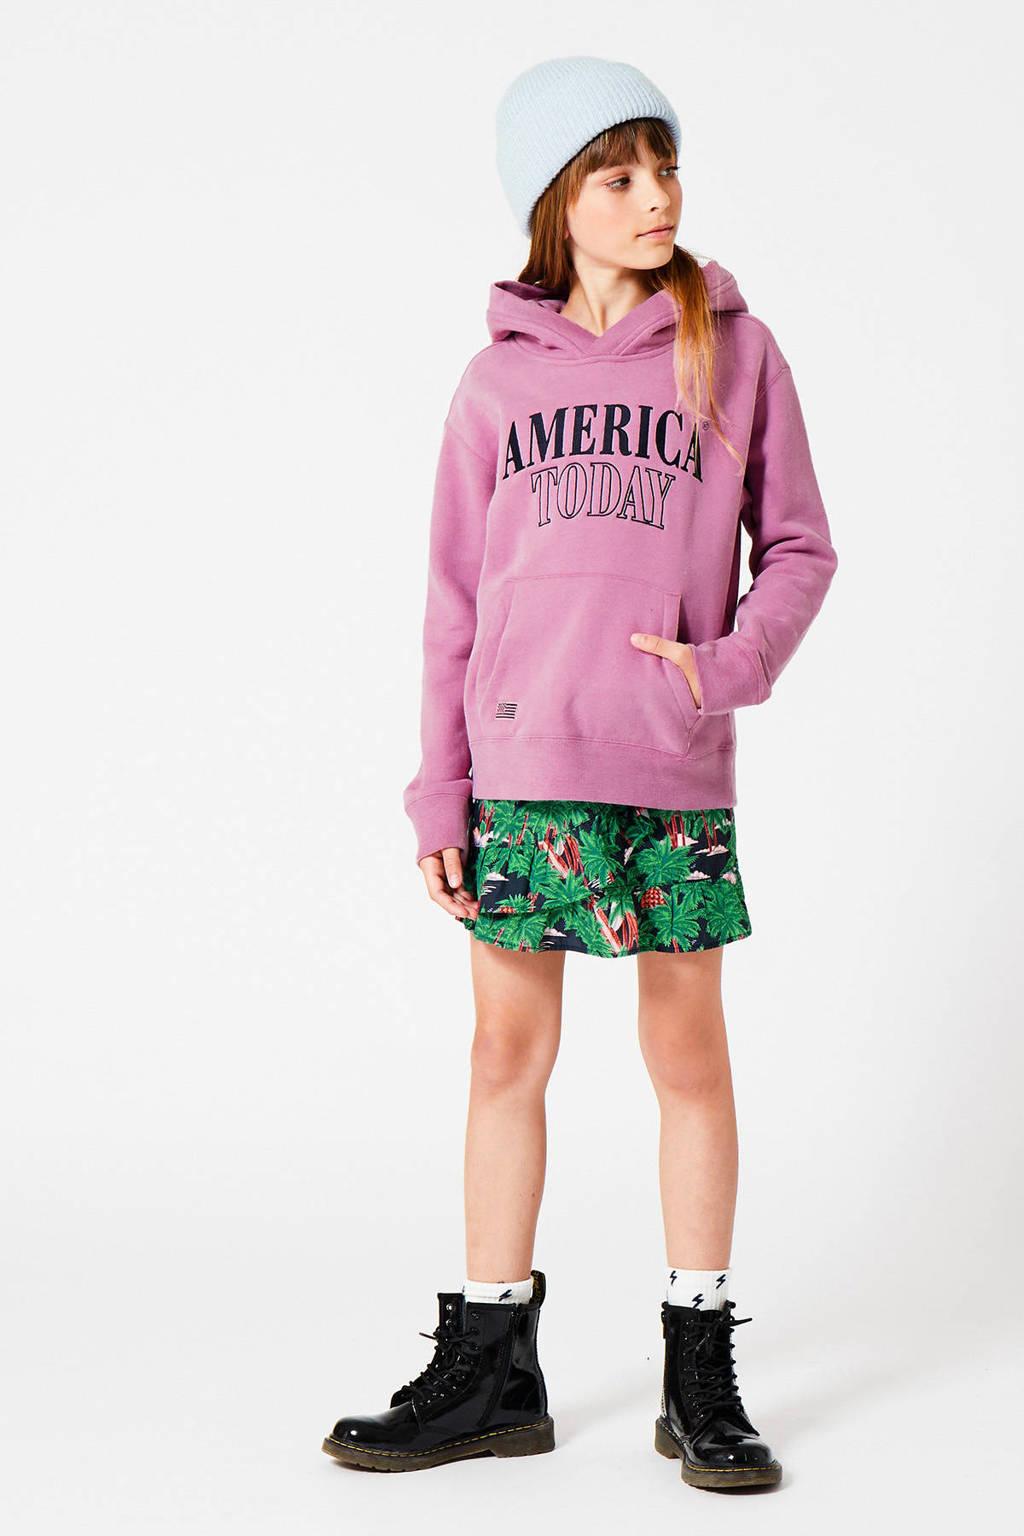 America Today Junior rok Rose-Ann met bladprint groen/blauw/oranje, Groen/blauw/oranje